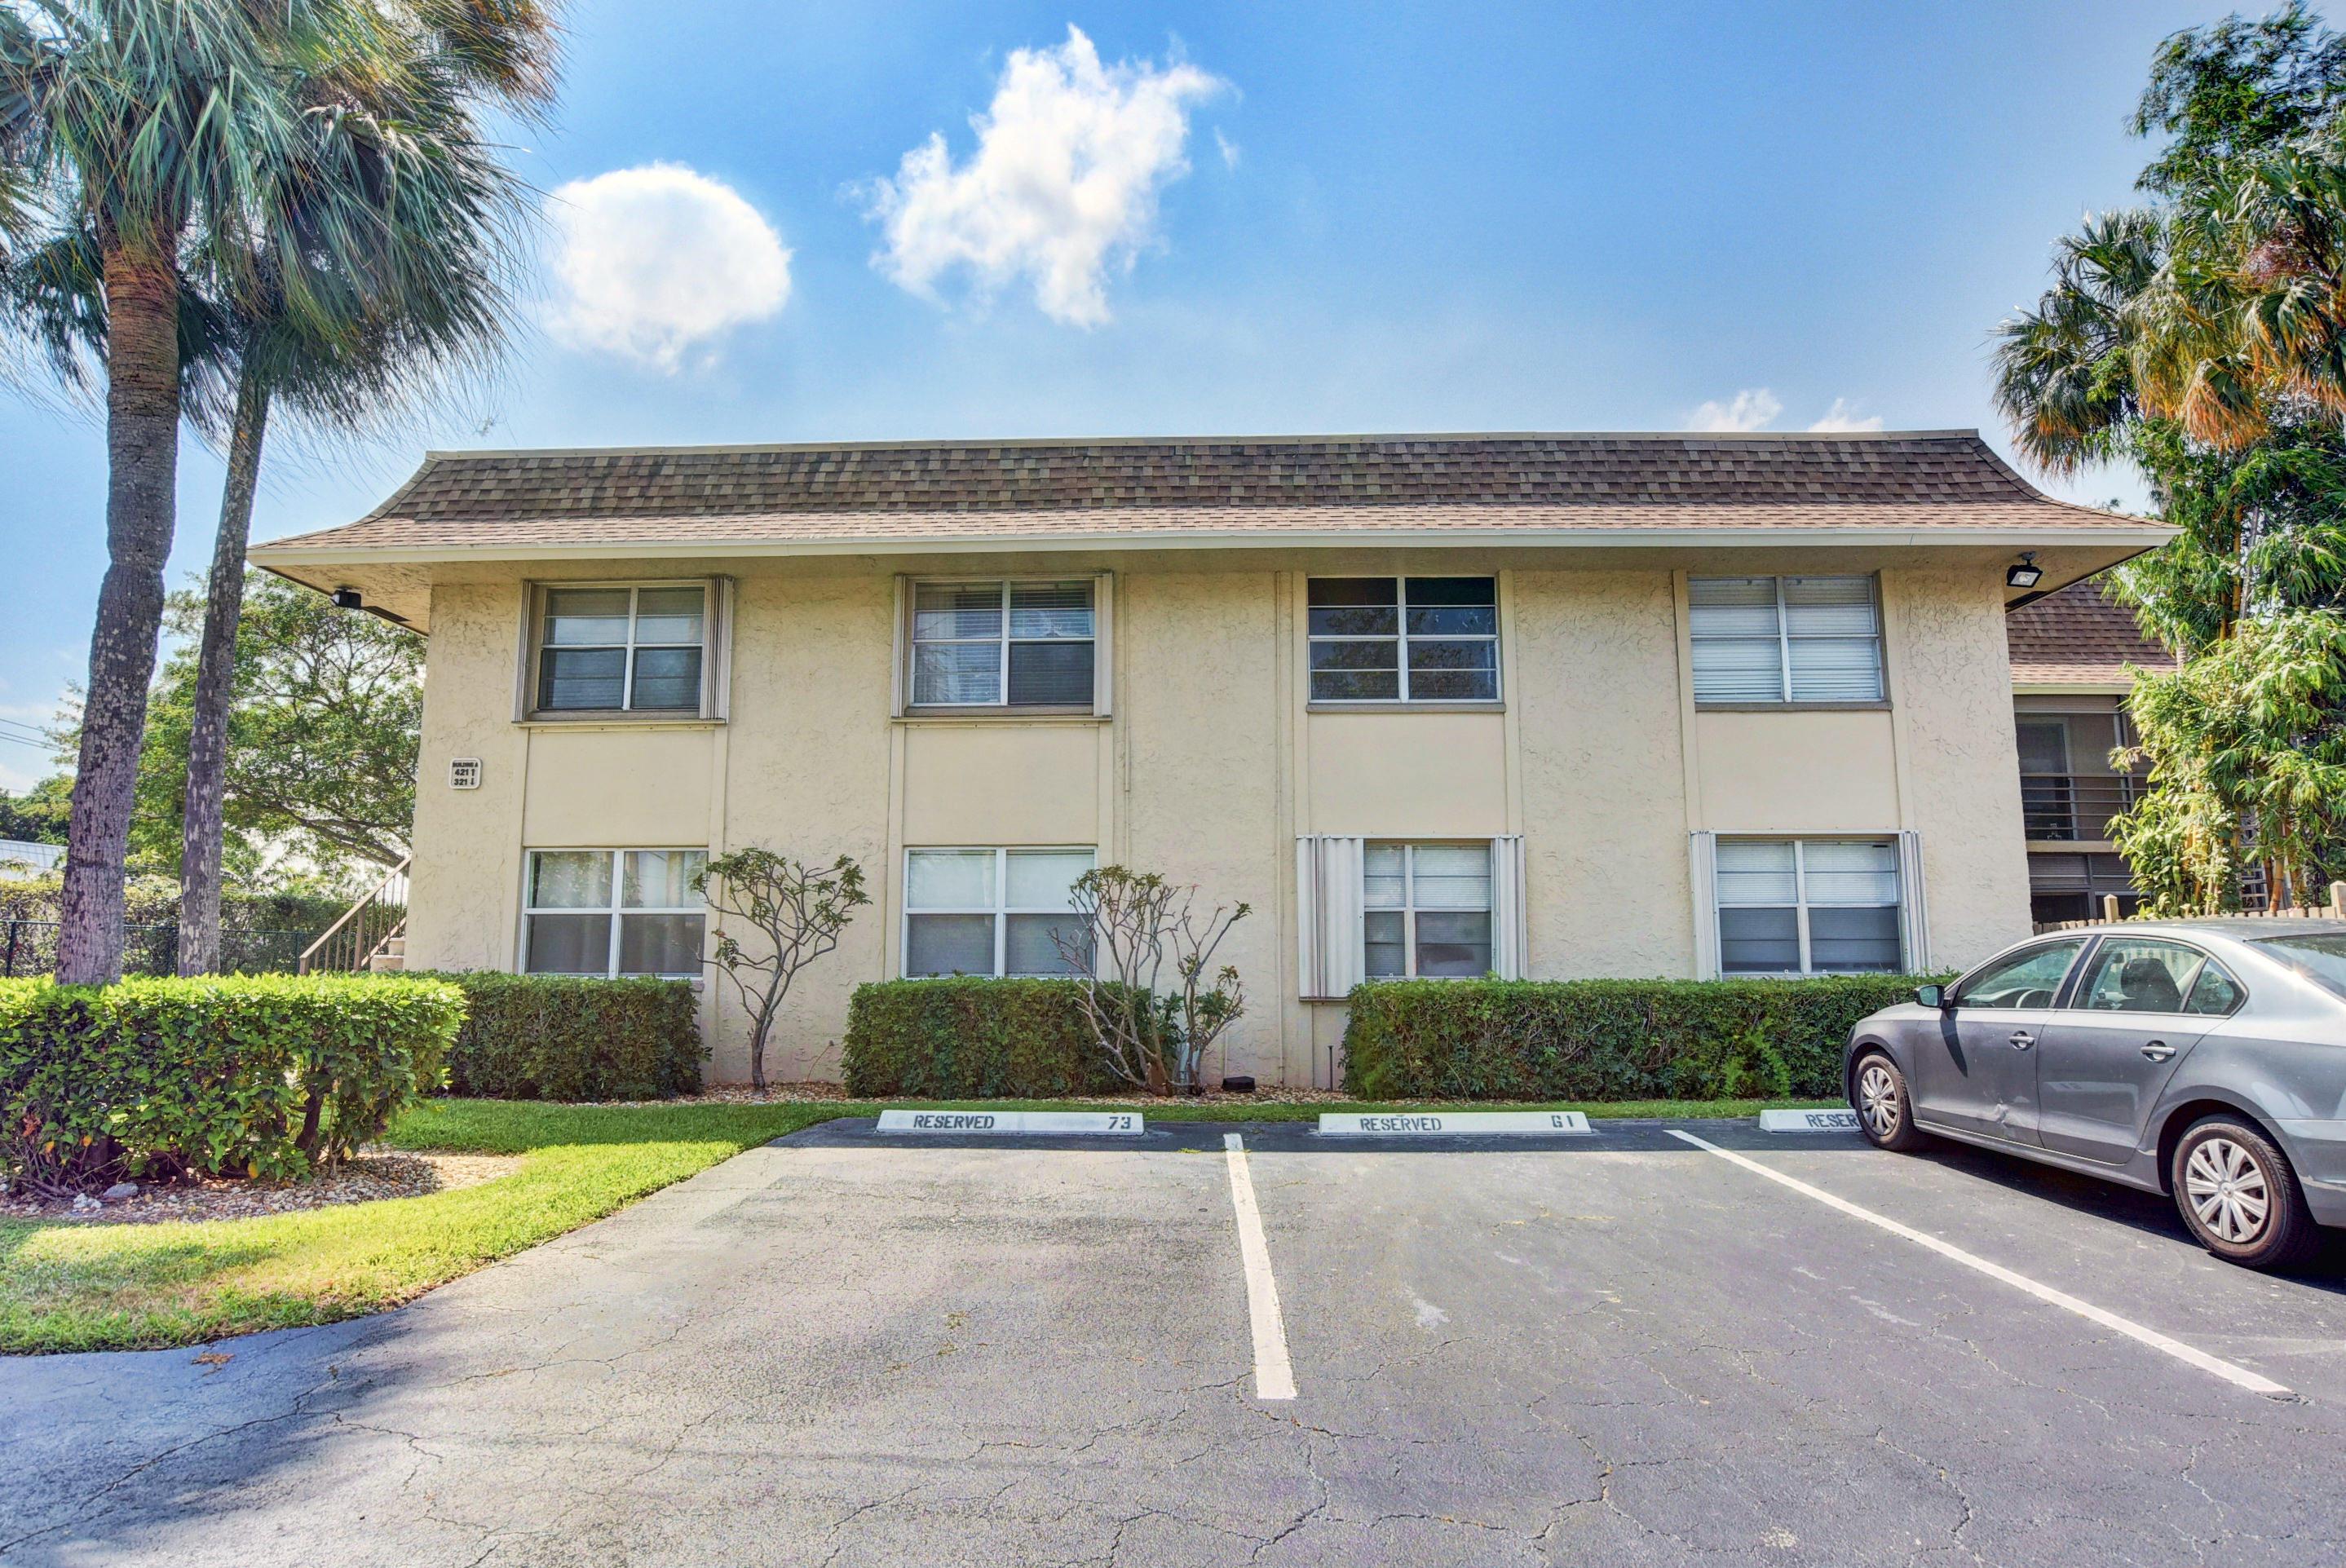 Home for sale in Boca Linda Boca Raton Florida